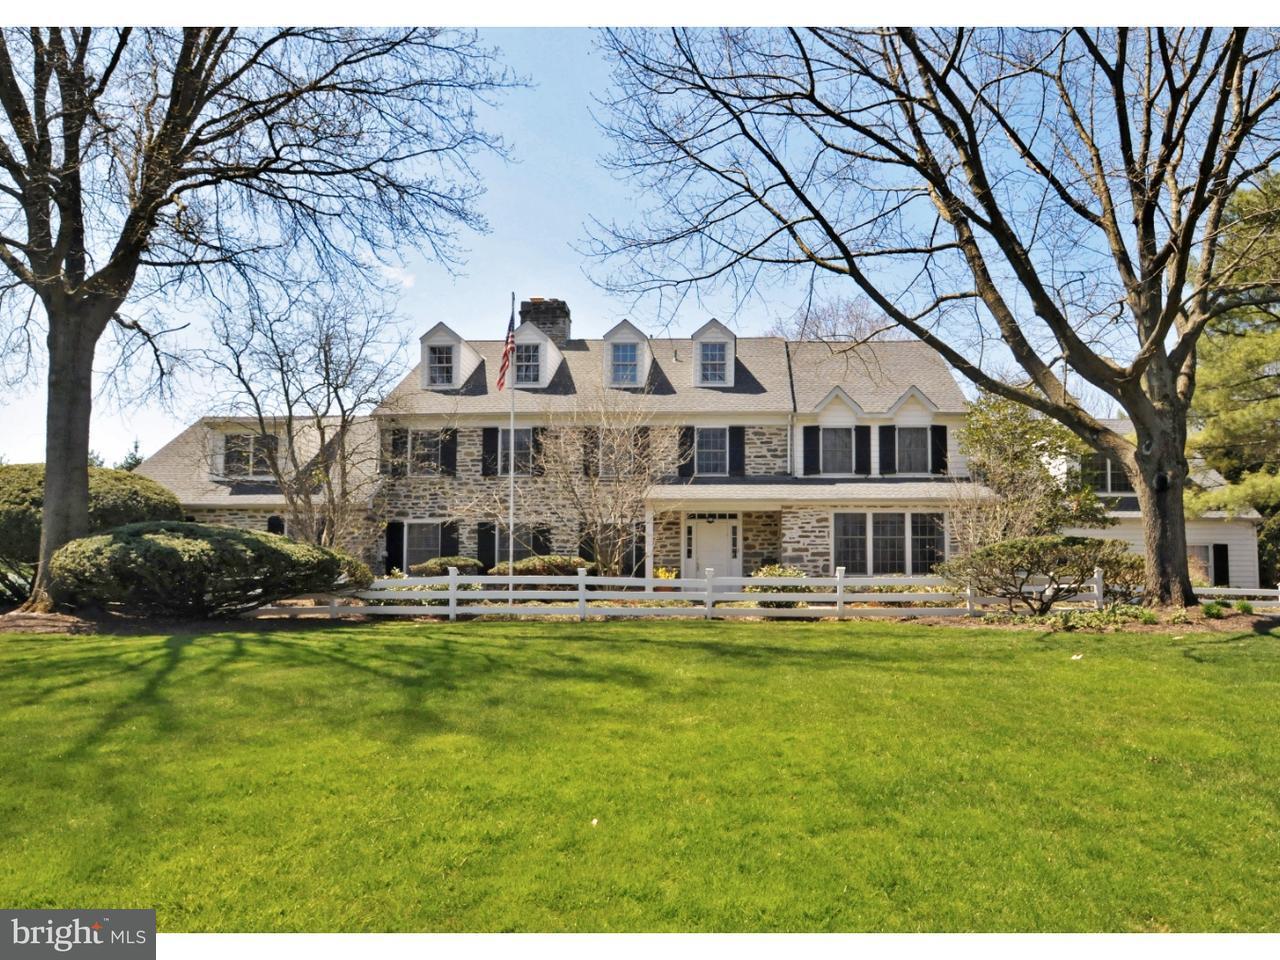 Single Family Home for Sale at 1508 GRASSHOPPER Lane Gwynedd Valley, Pennsylvania 19437 United States